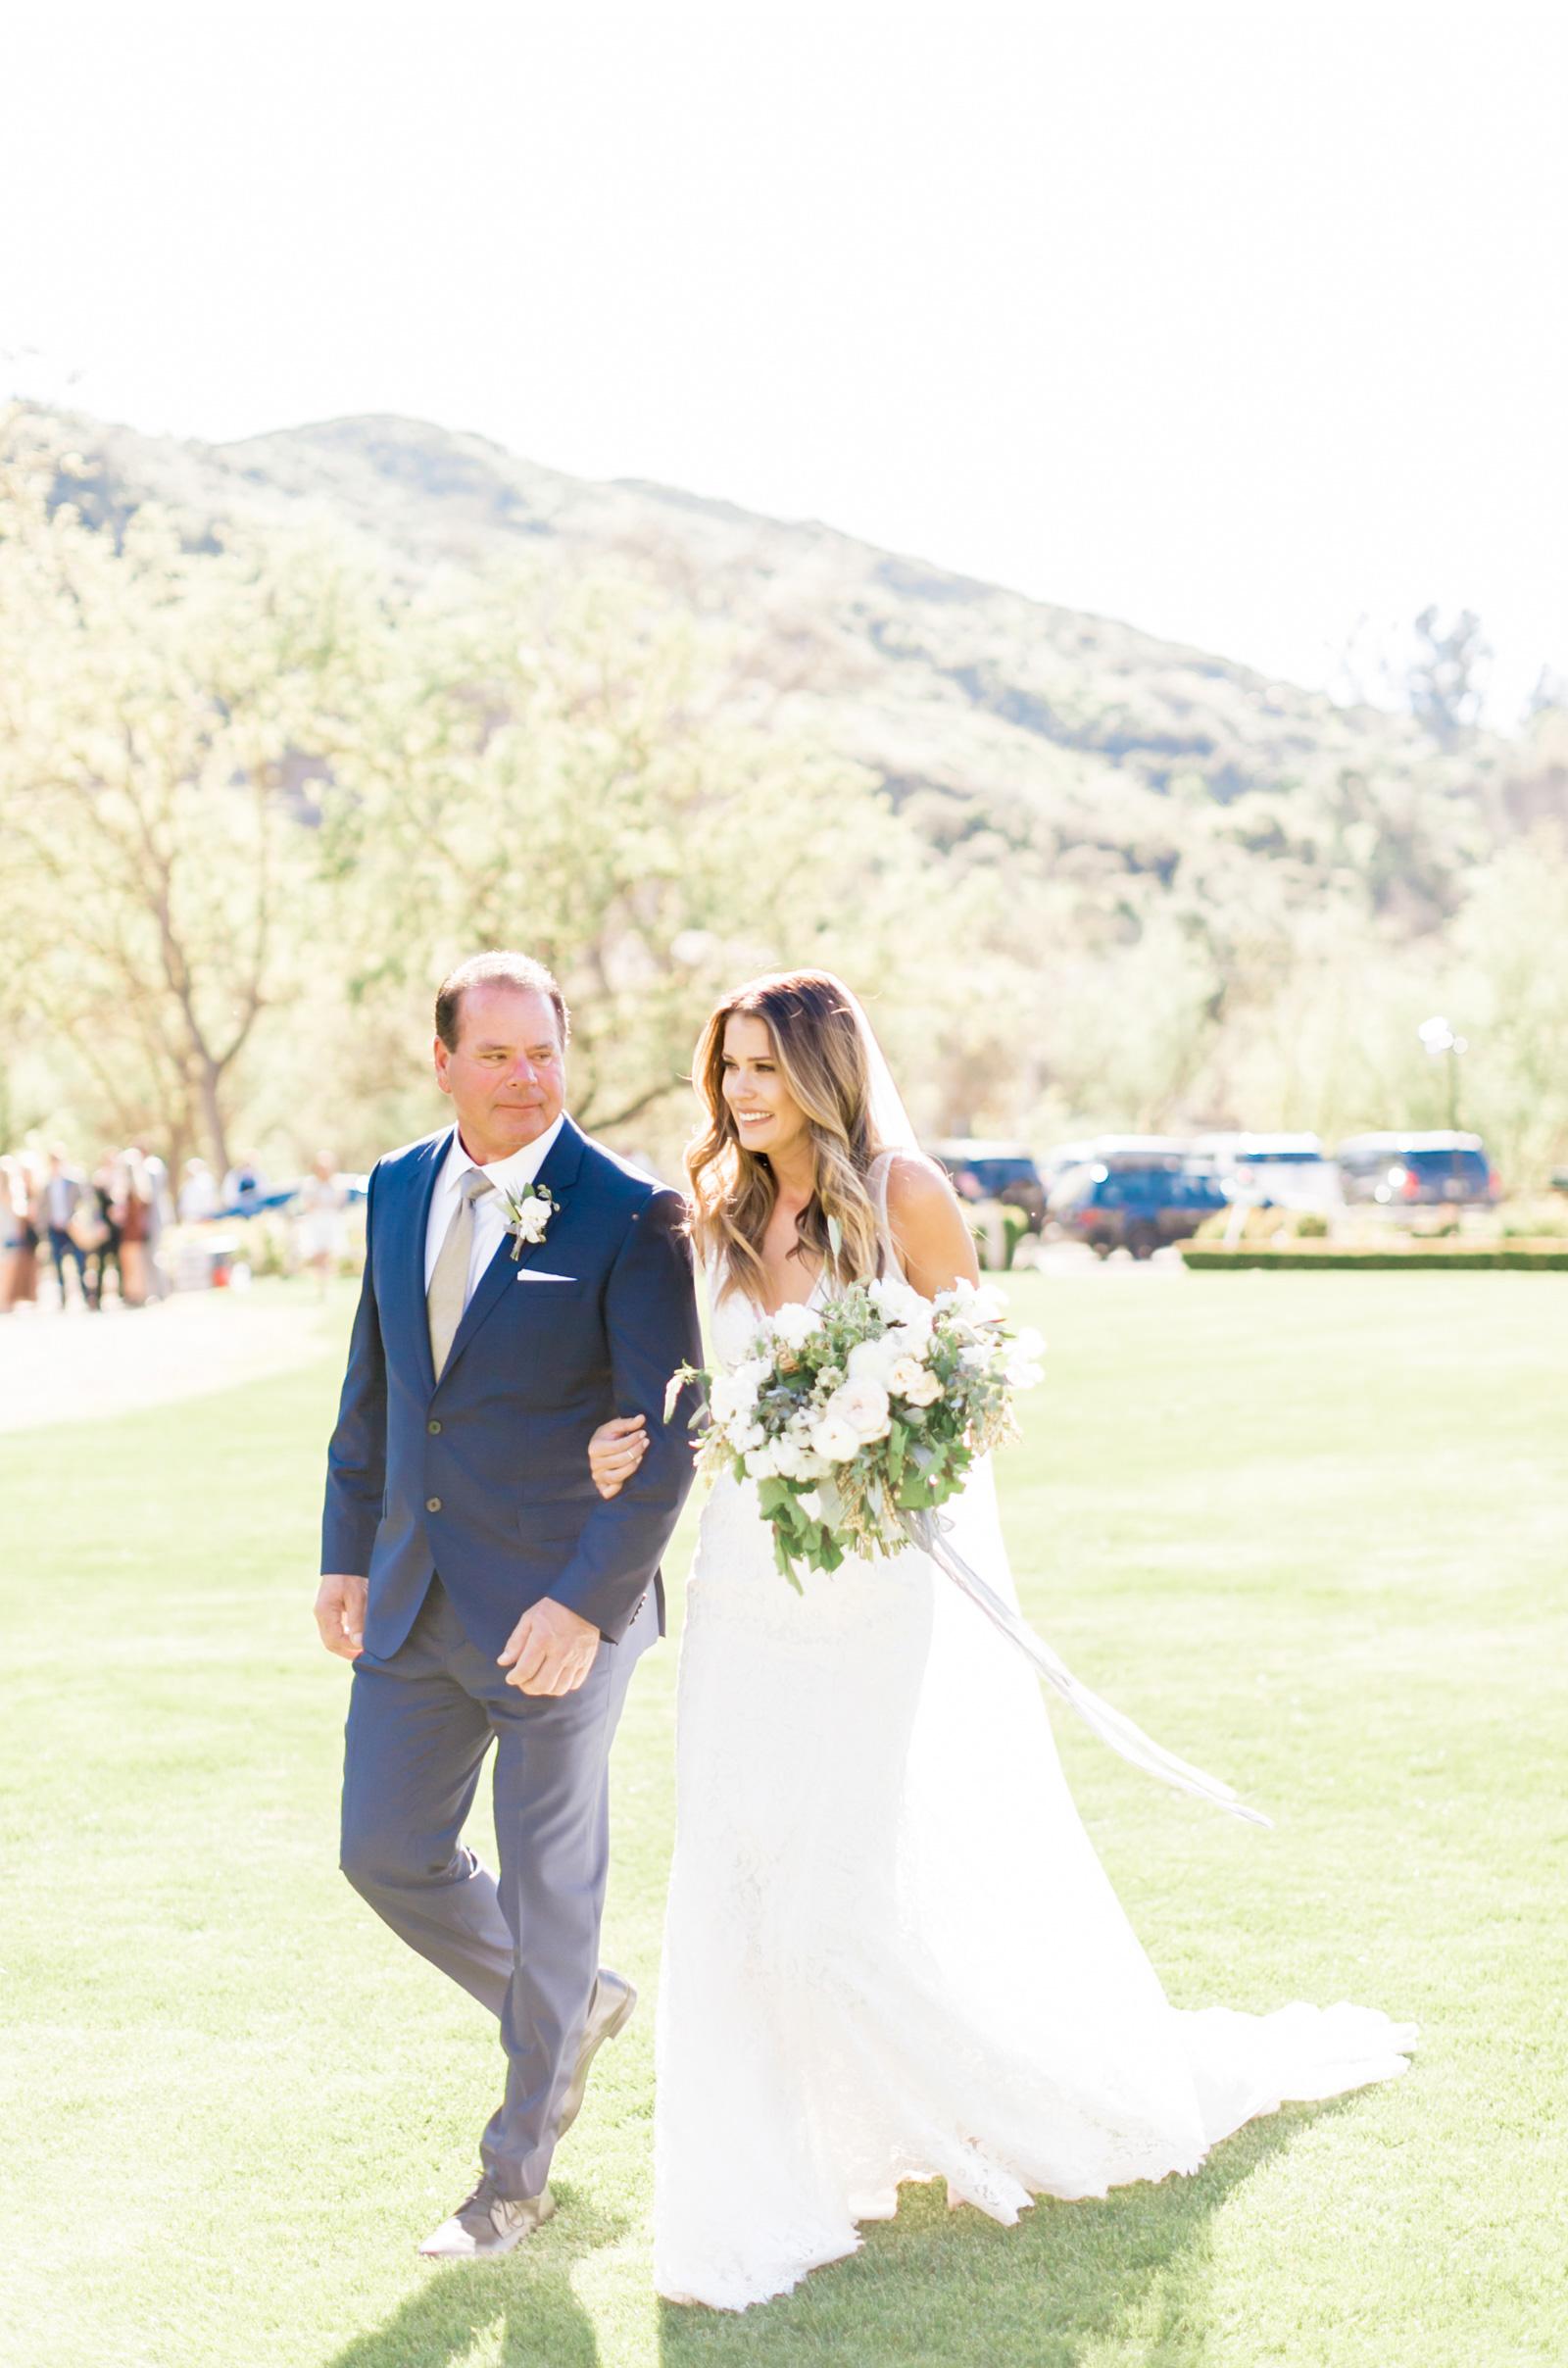 Malibu-Wedding-Photographer-Triunfo-Creek-Natalie-Schutt-Photography_17.jpg